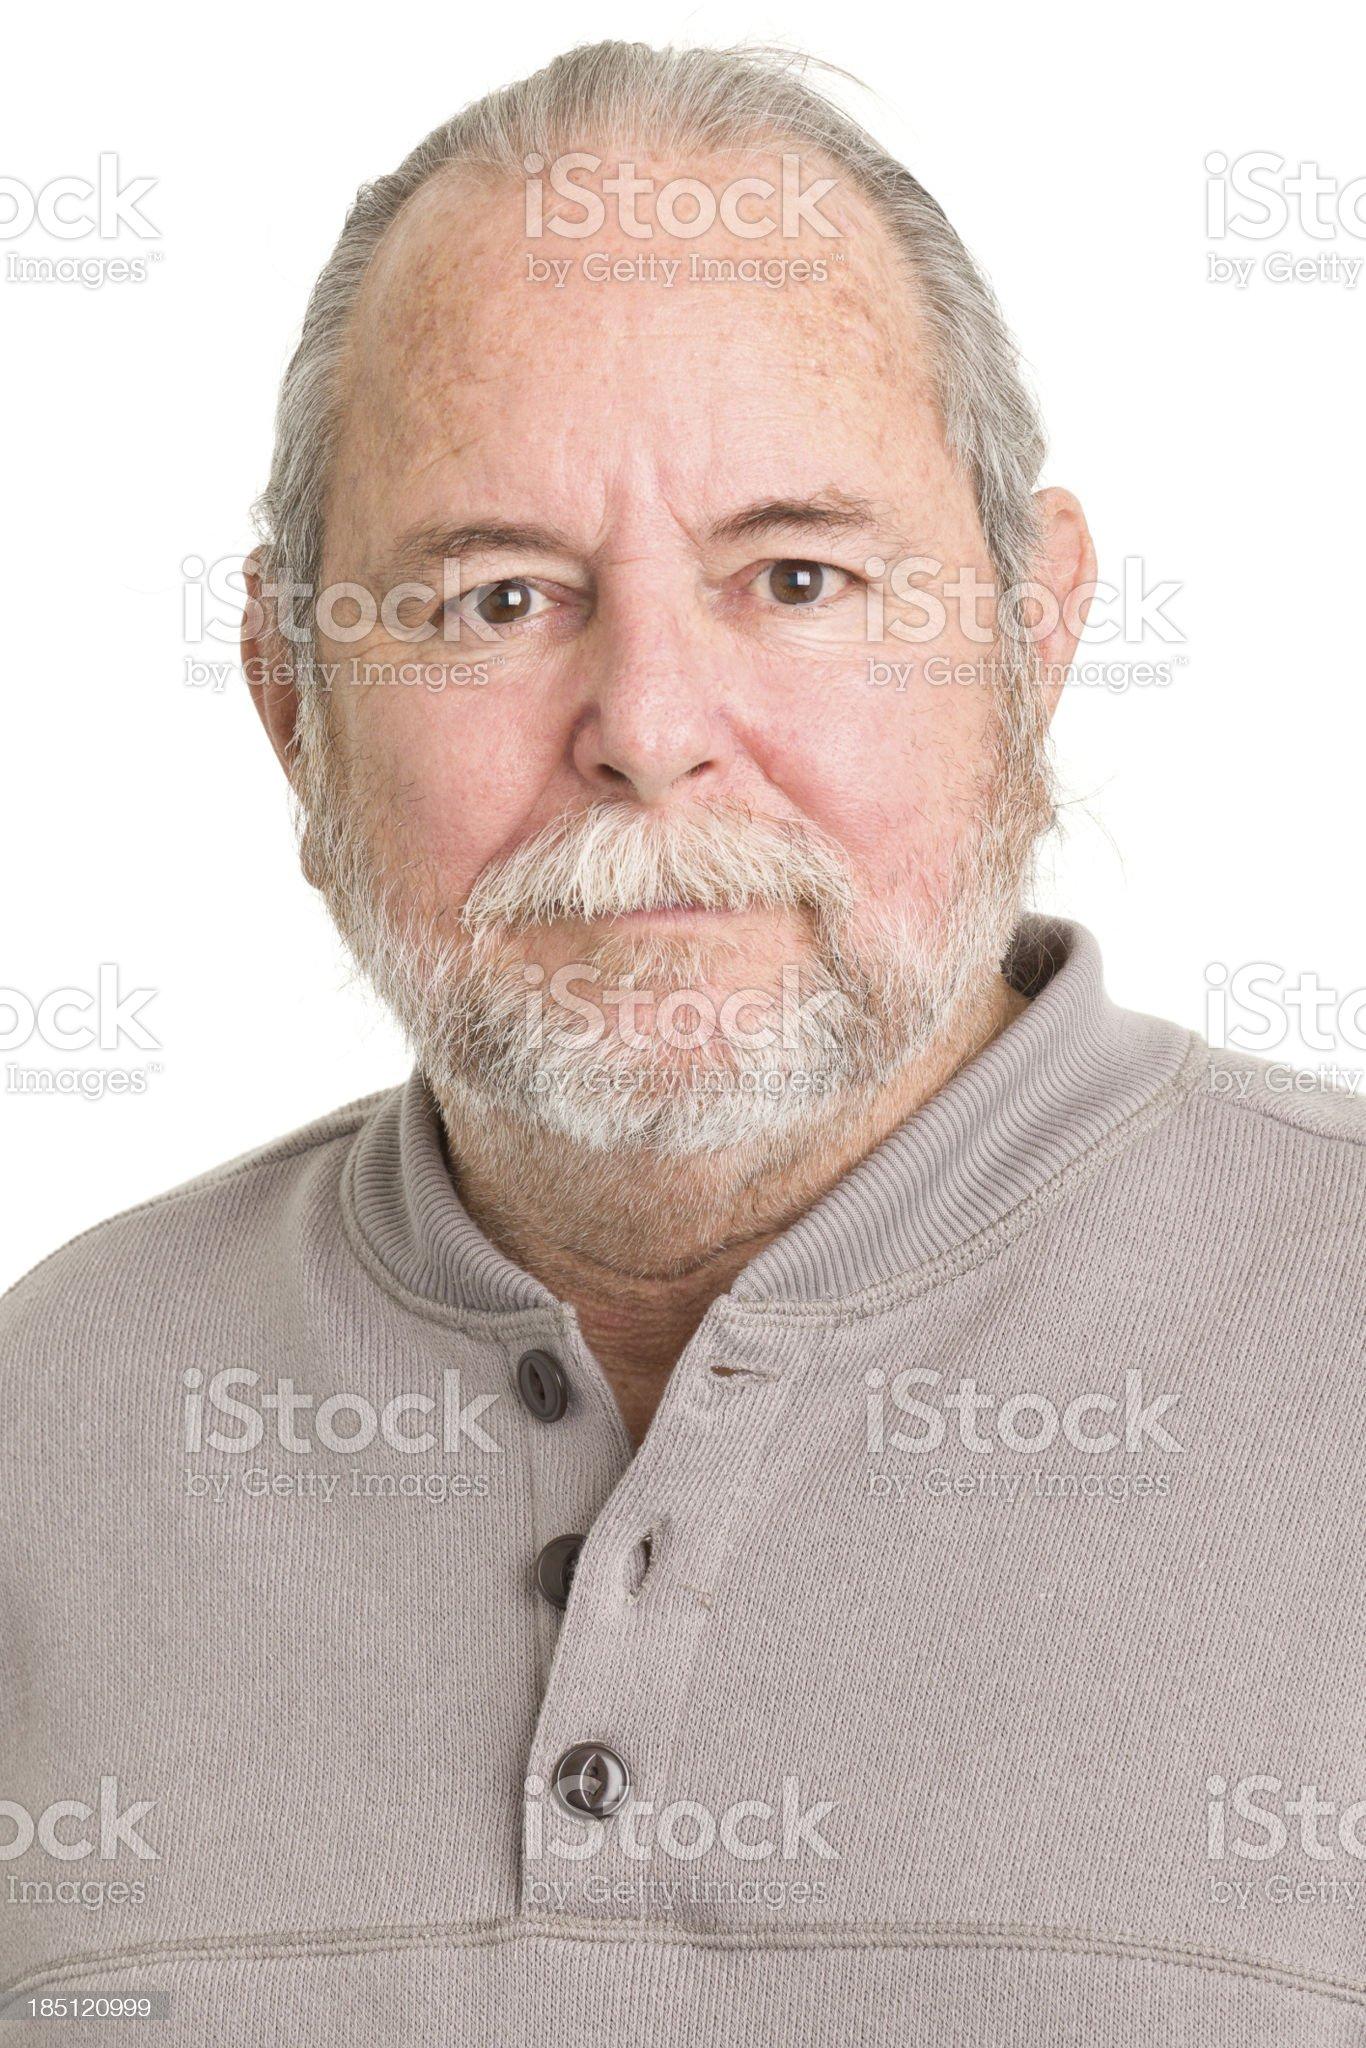 Senior Man Close-up Portrait royalty-free stock photo